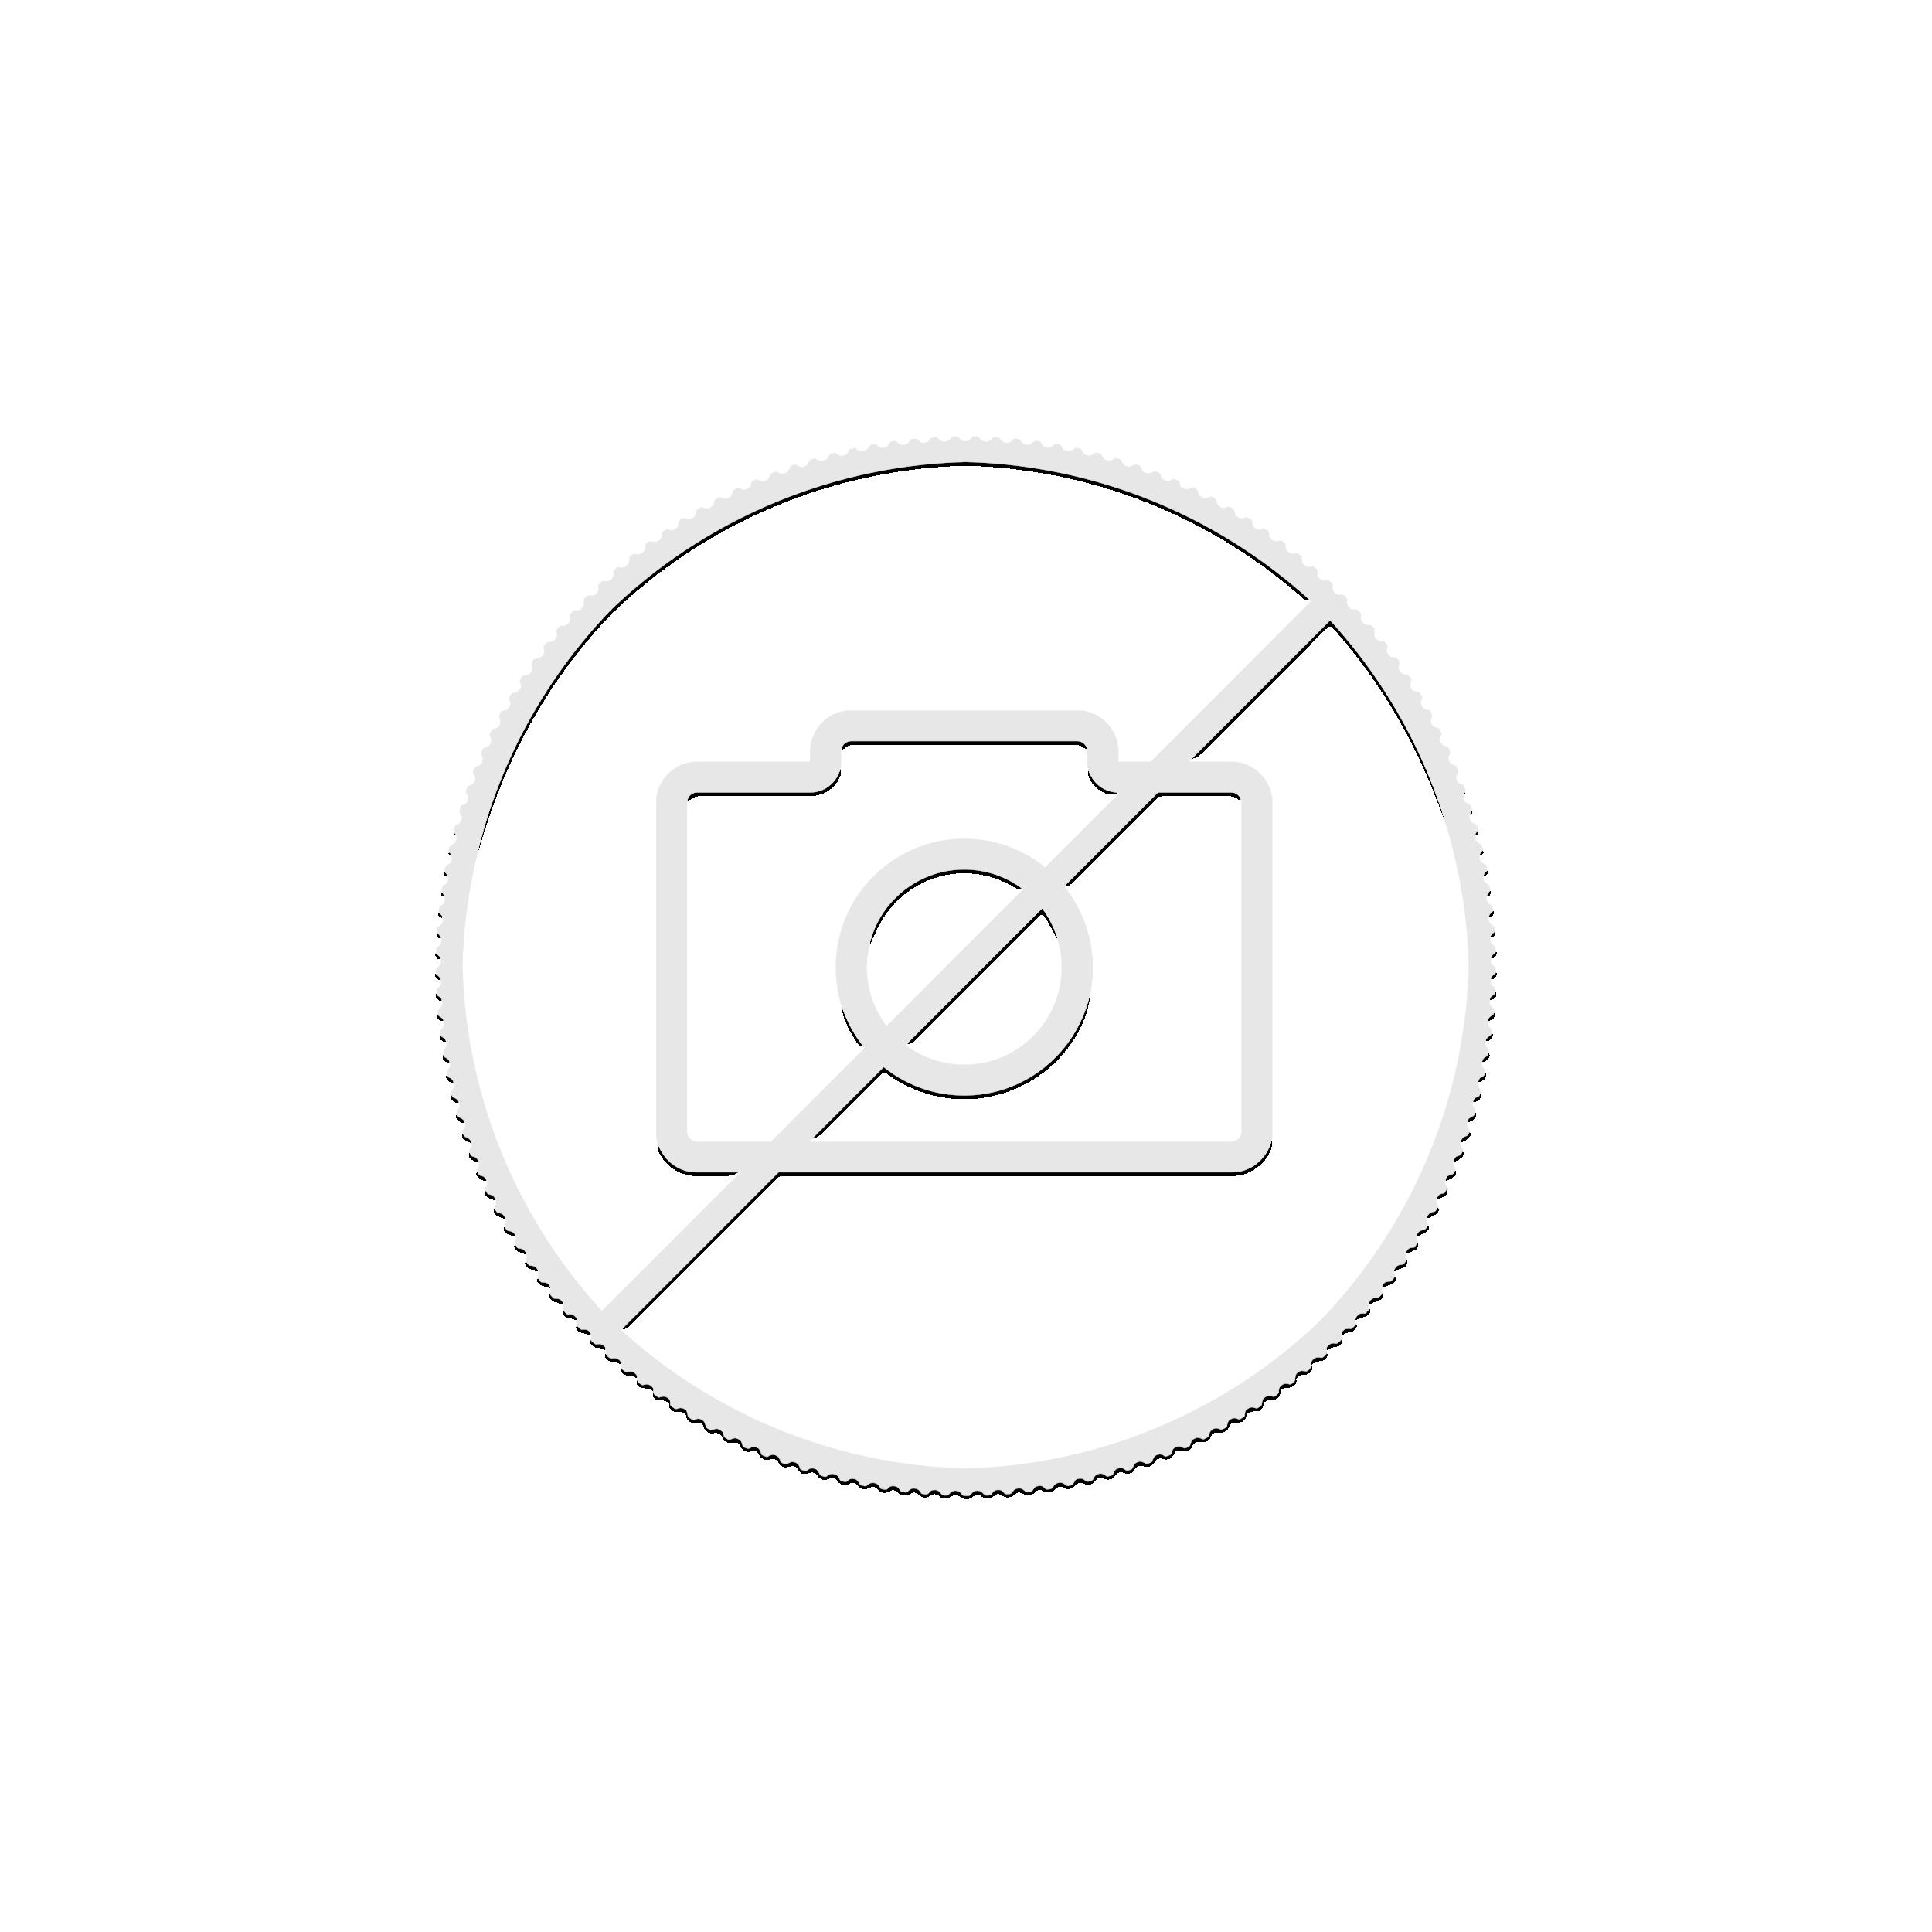 Gold ten guilder coin Australia - 2006